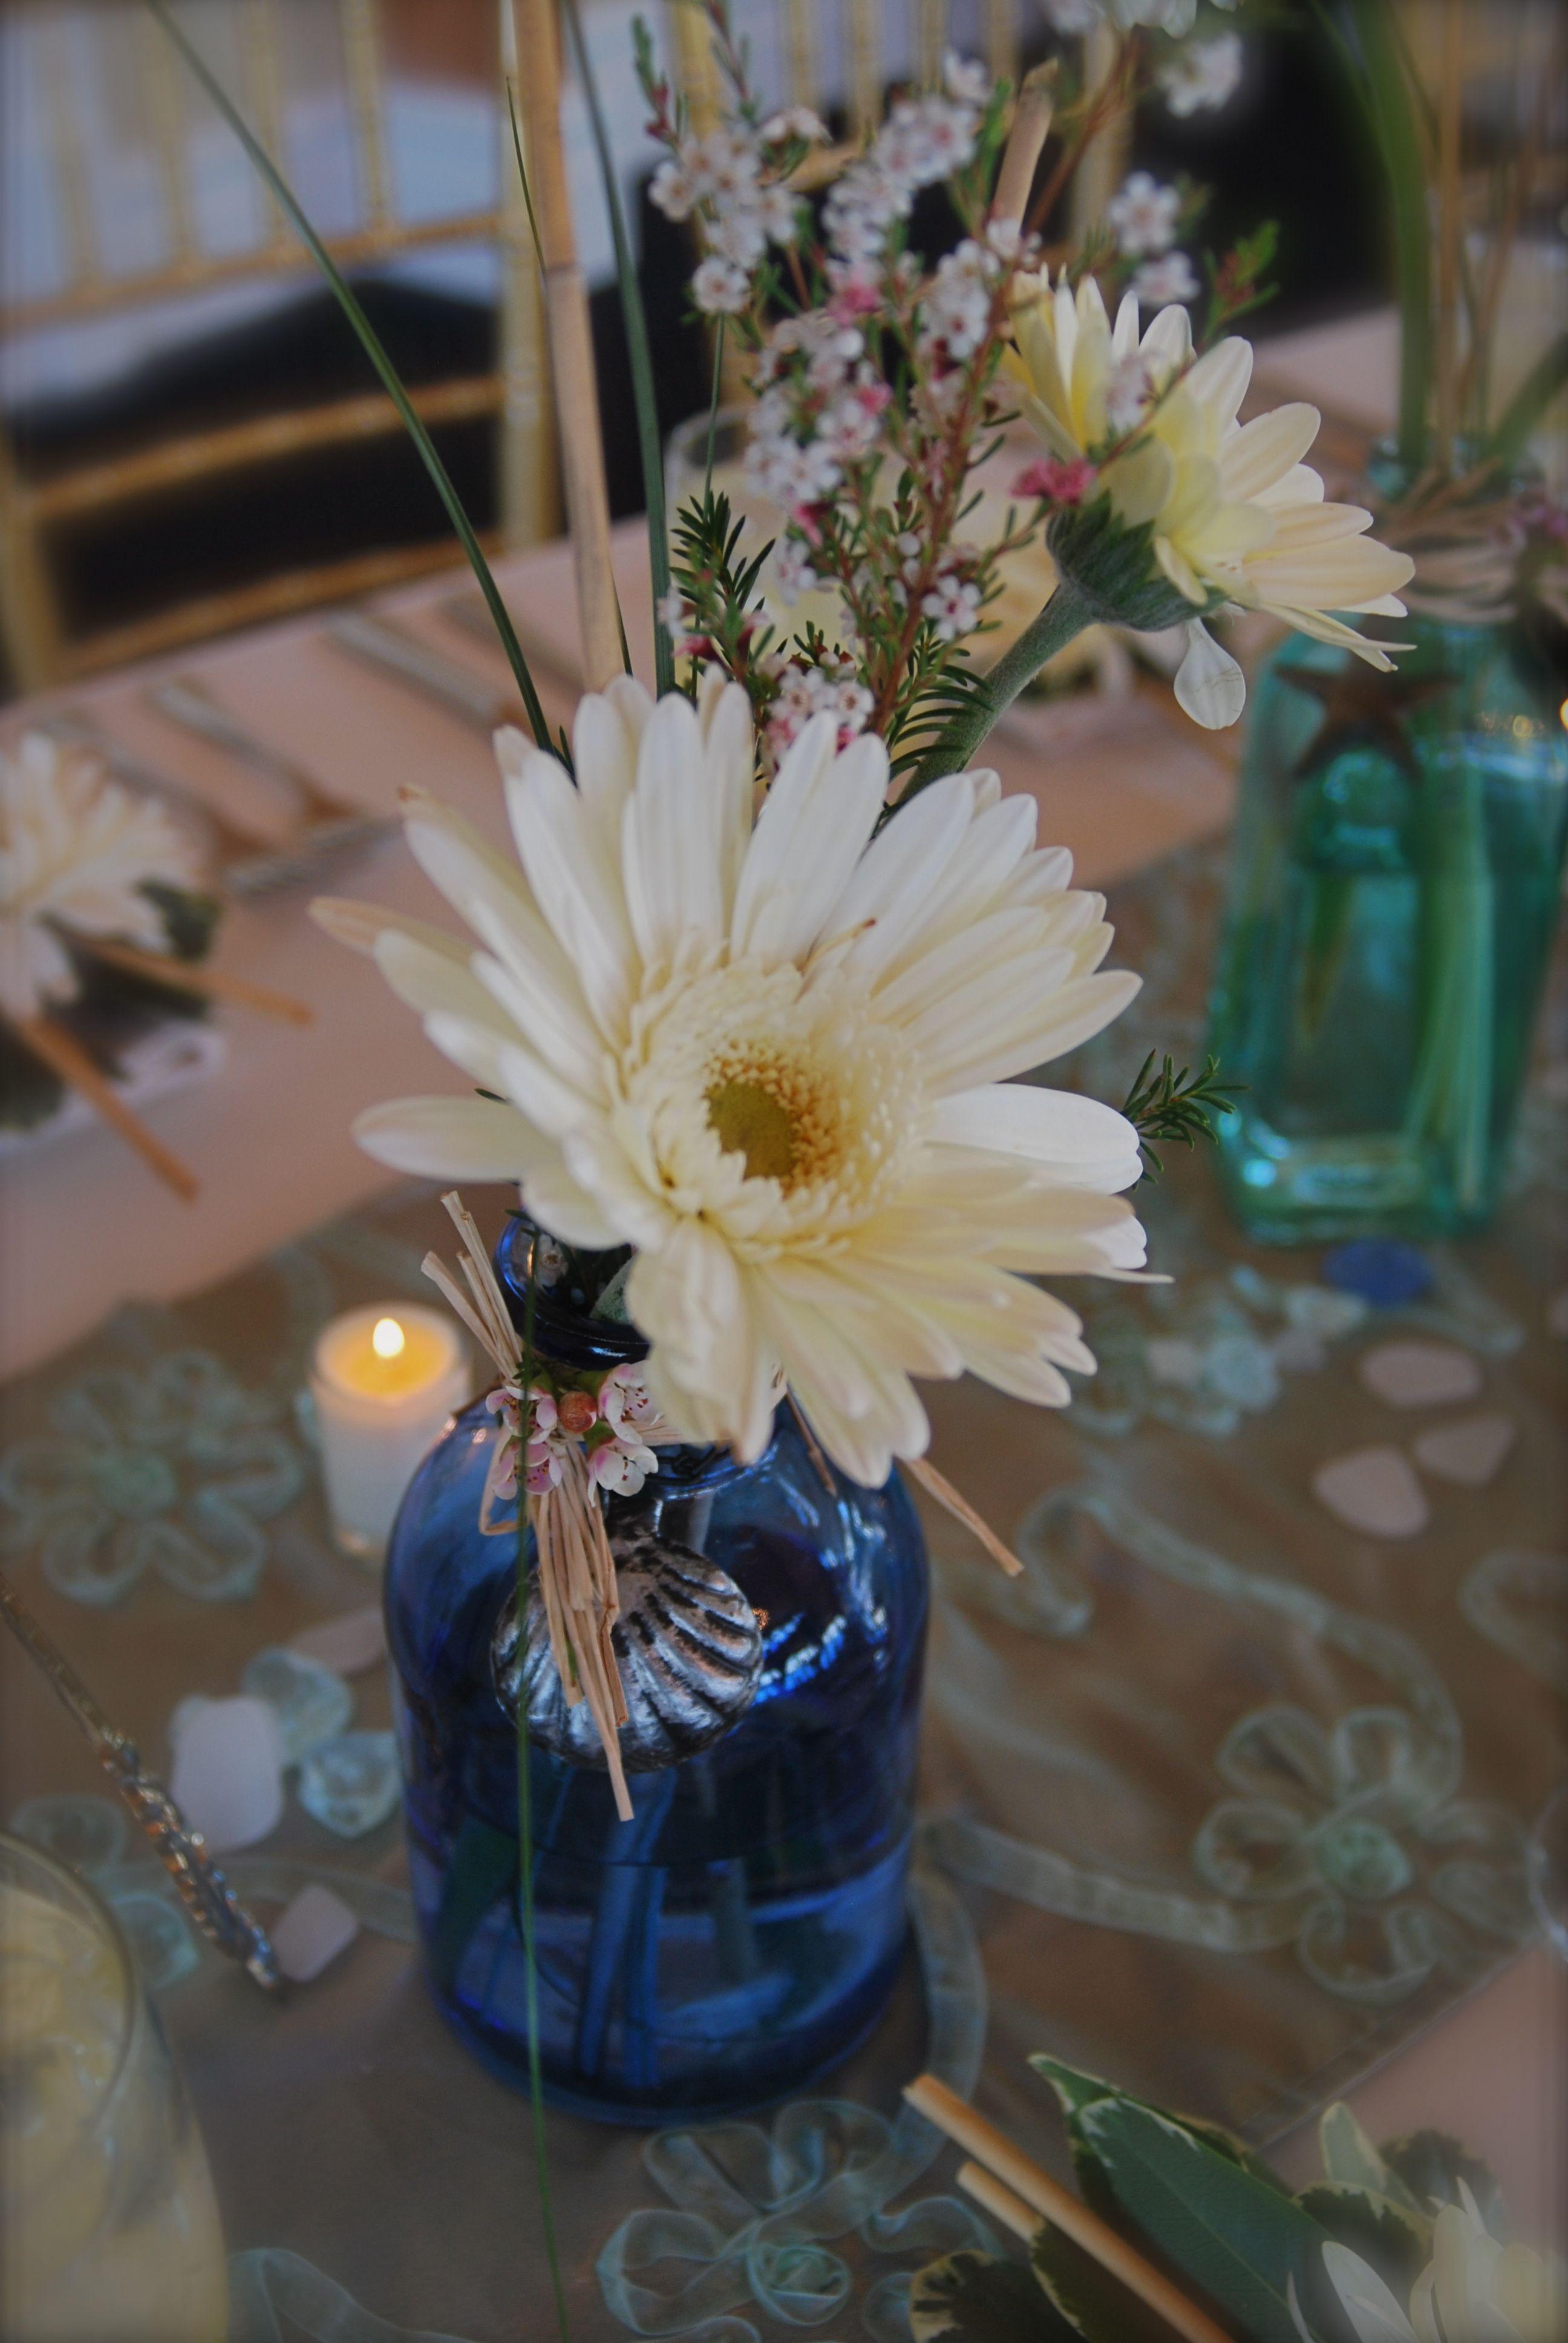 gerbera daisy in jar, vintage bottles centerpiece, bottles